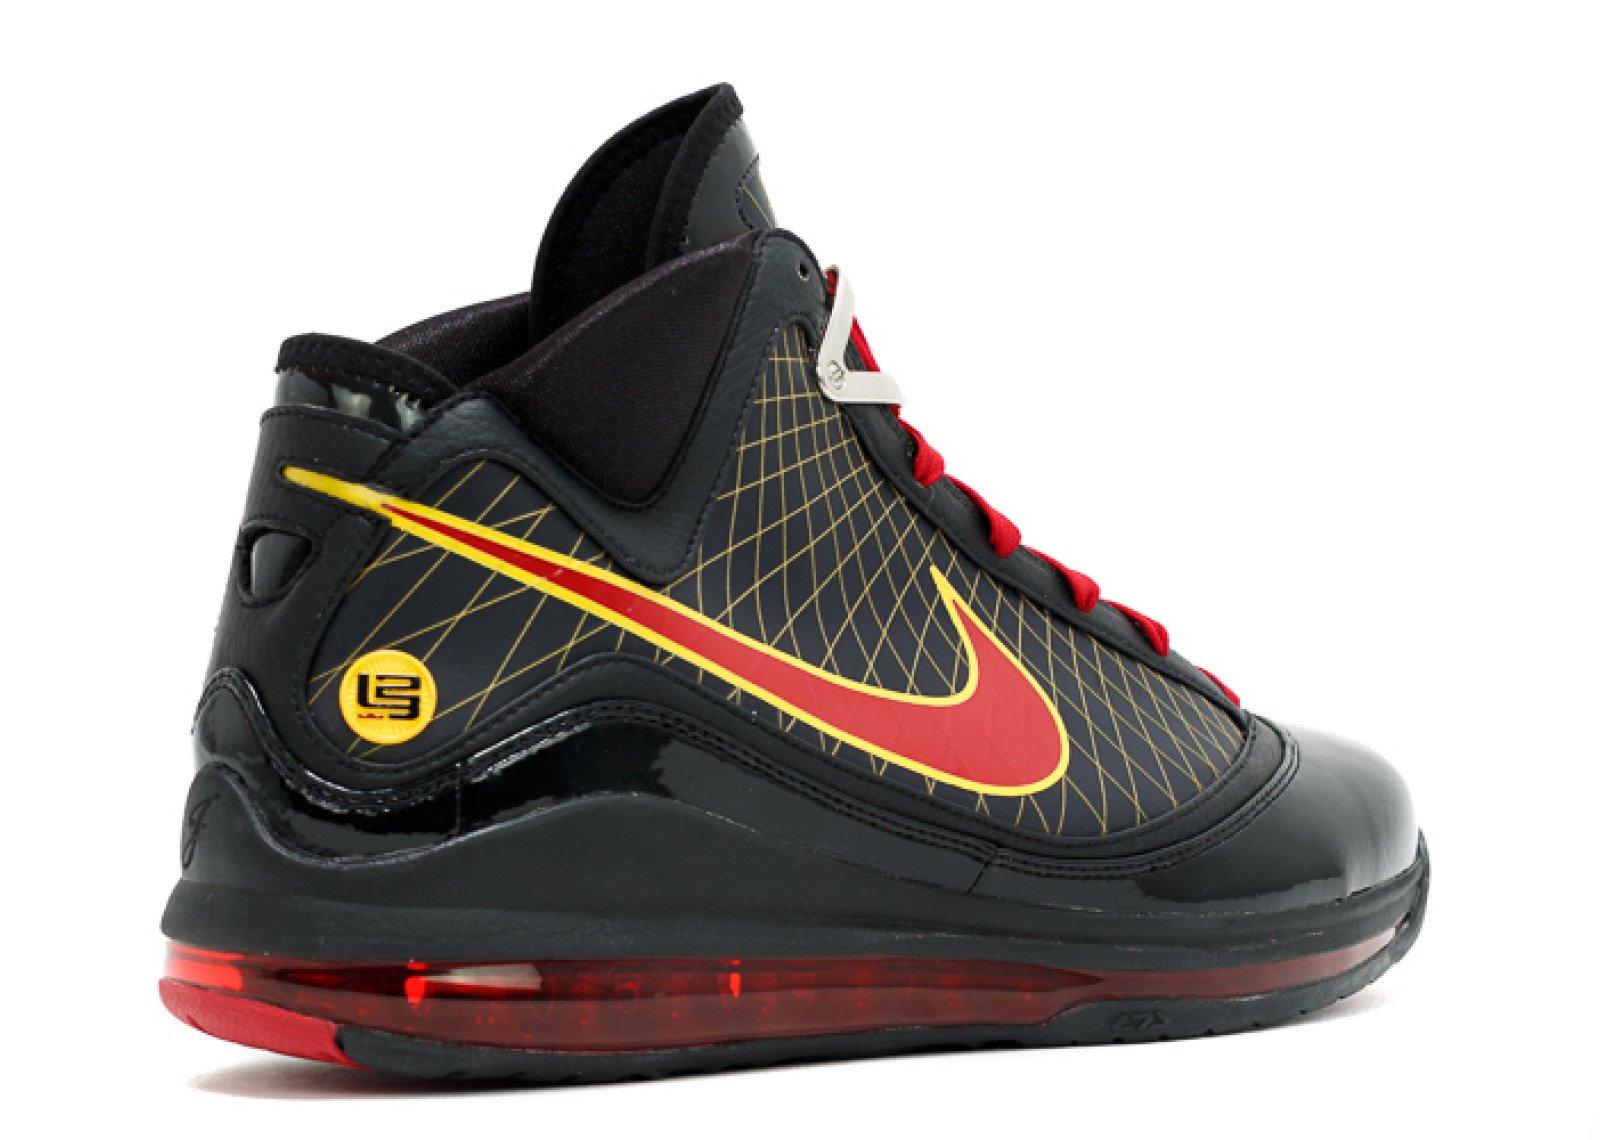 Nike LeBron 7 Fairfax Black Varsity Red Varsity Maize CU5646-001 Release Date Info